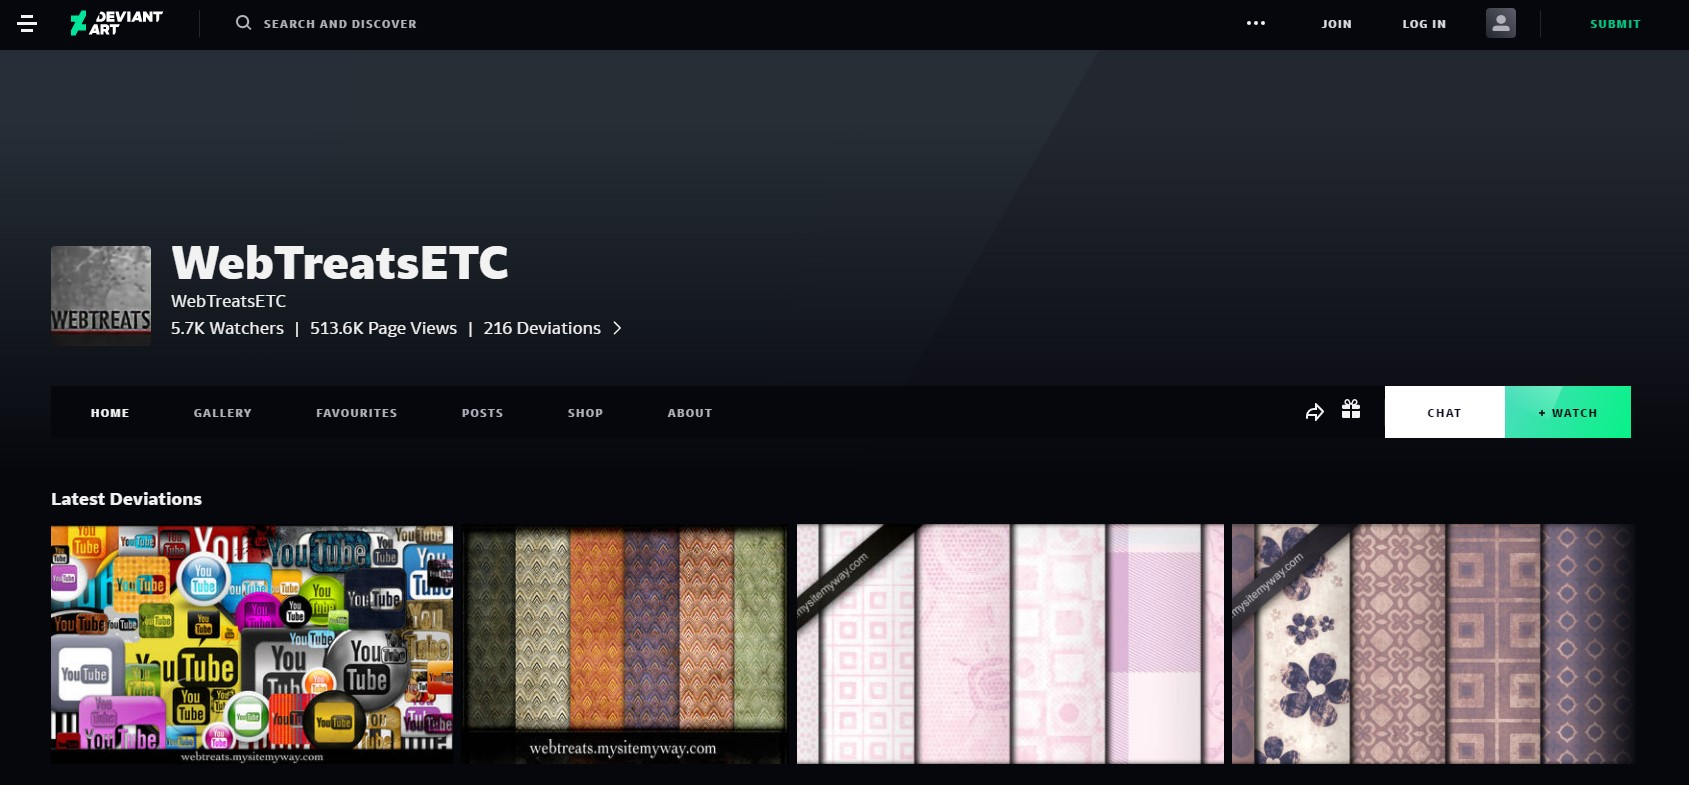 WebTreatsETC User Profile   DeviantArt